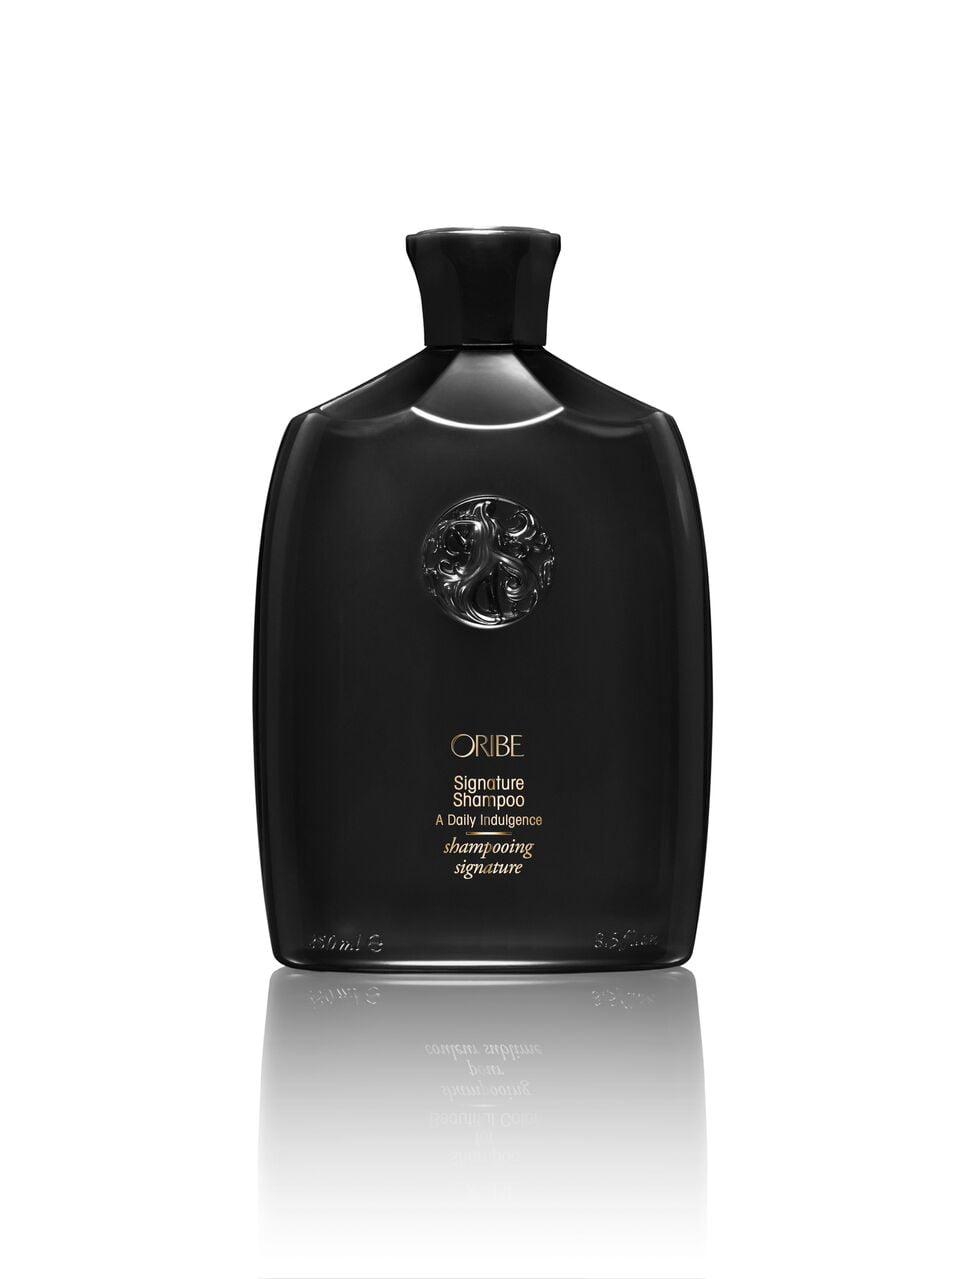 Oribe Signature Shampoo